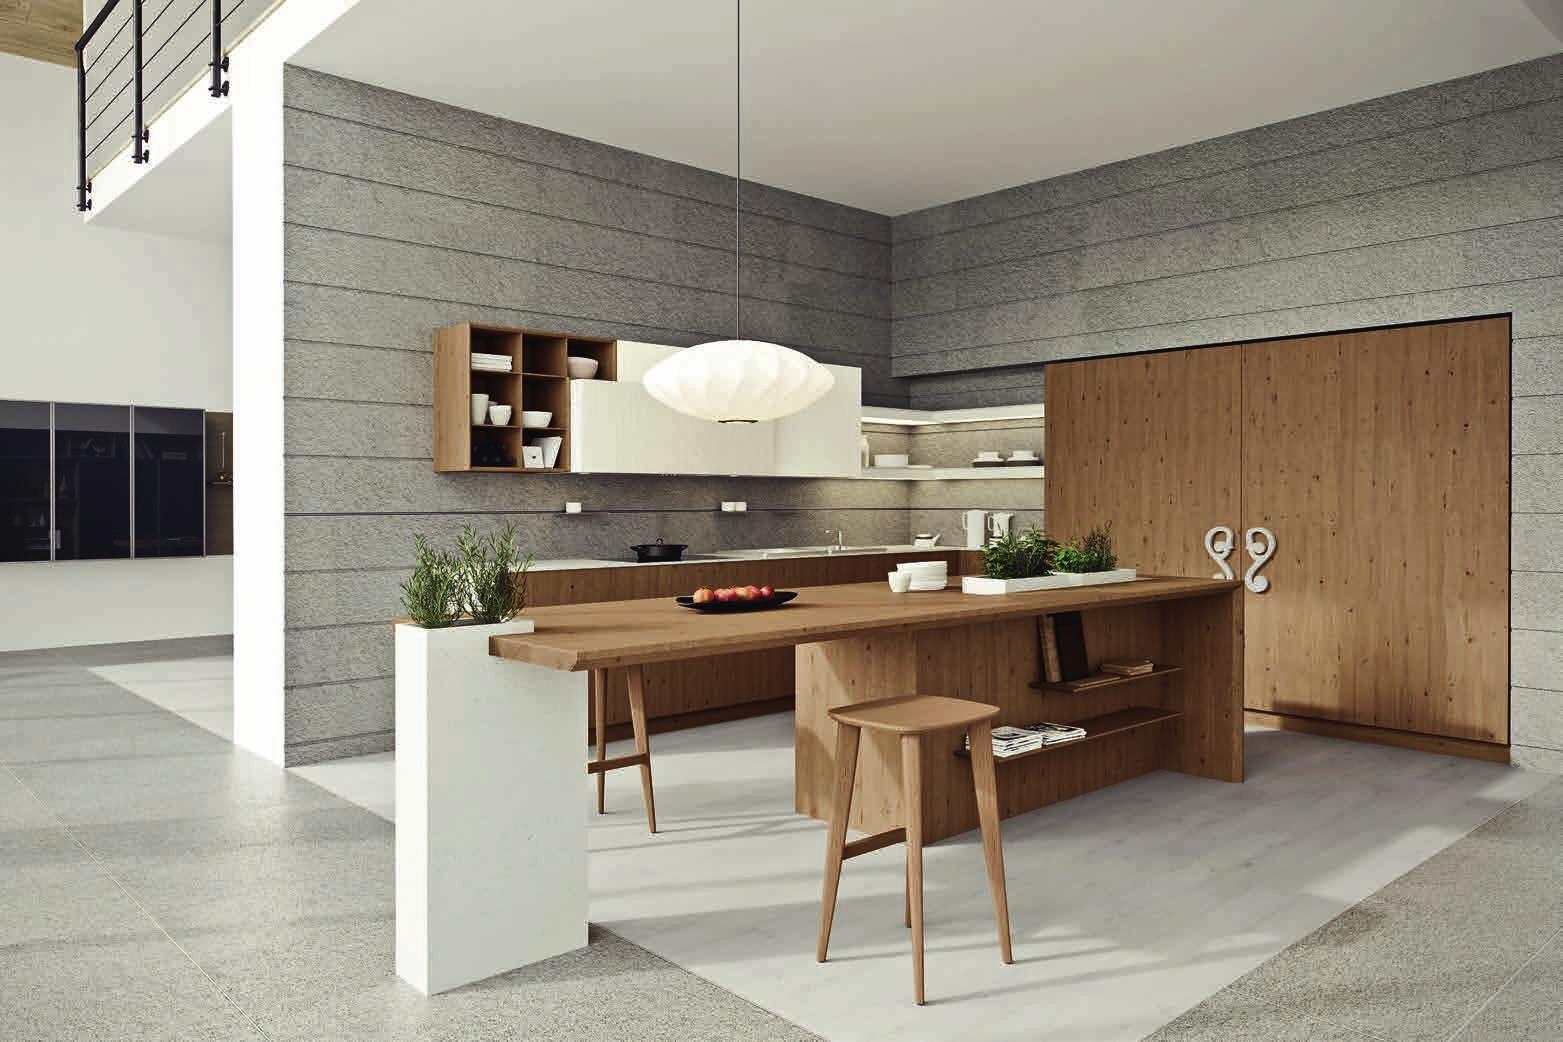 Interior design of large kitchen space